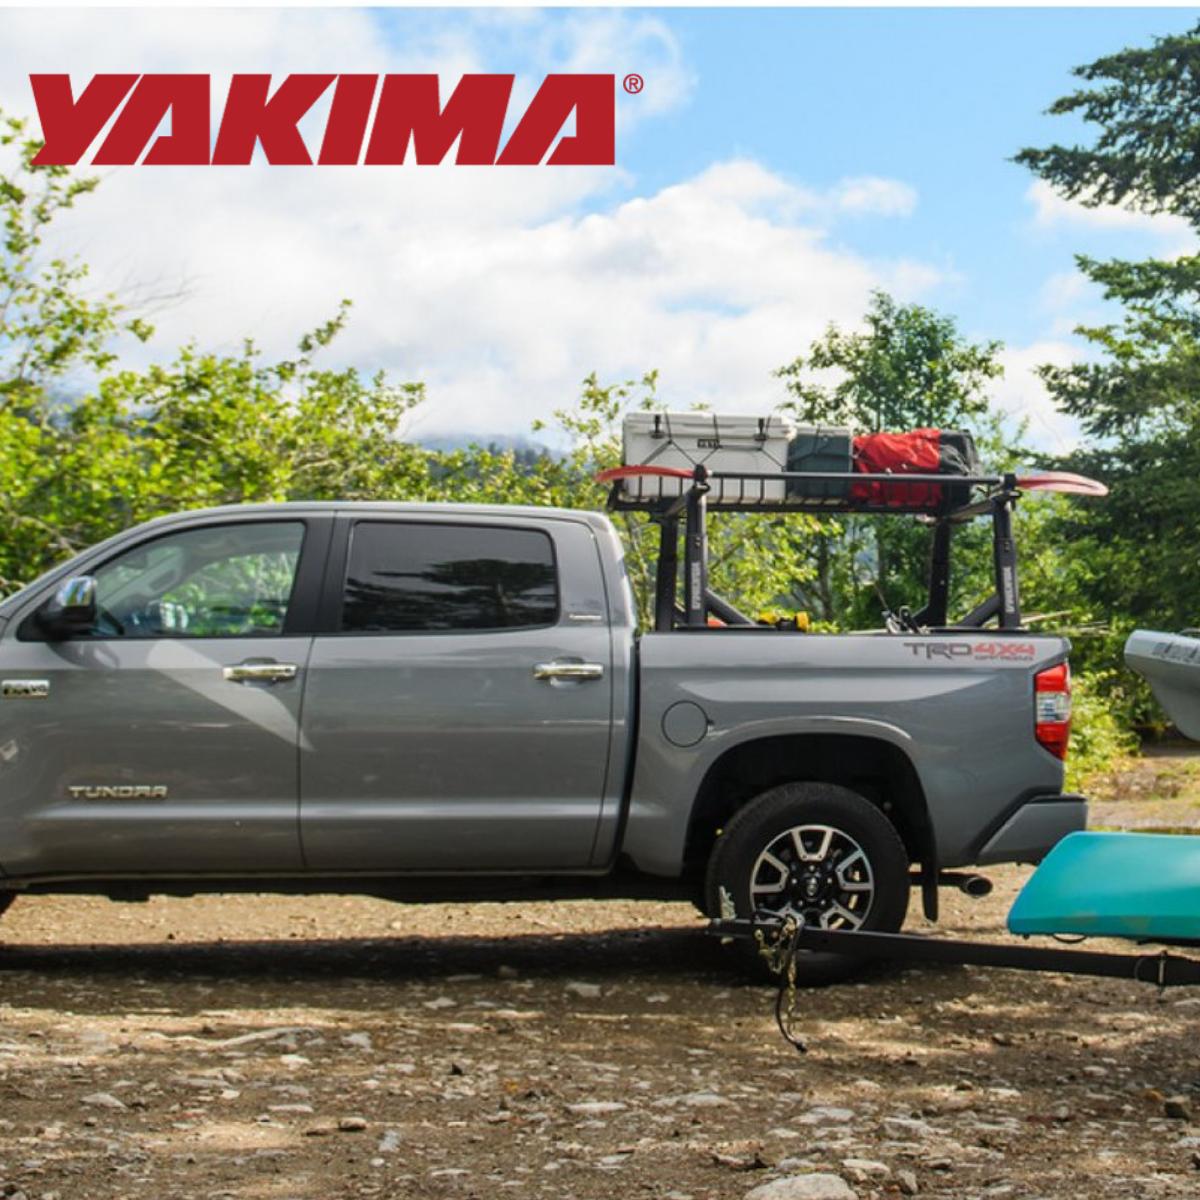 Yakima's Overhaul System